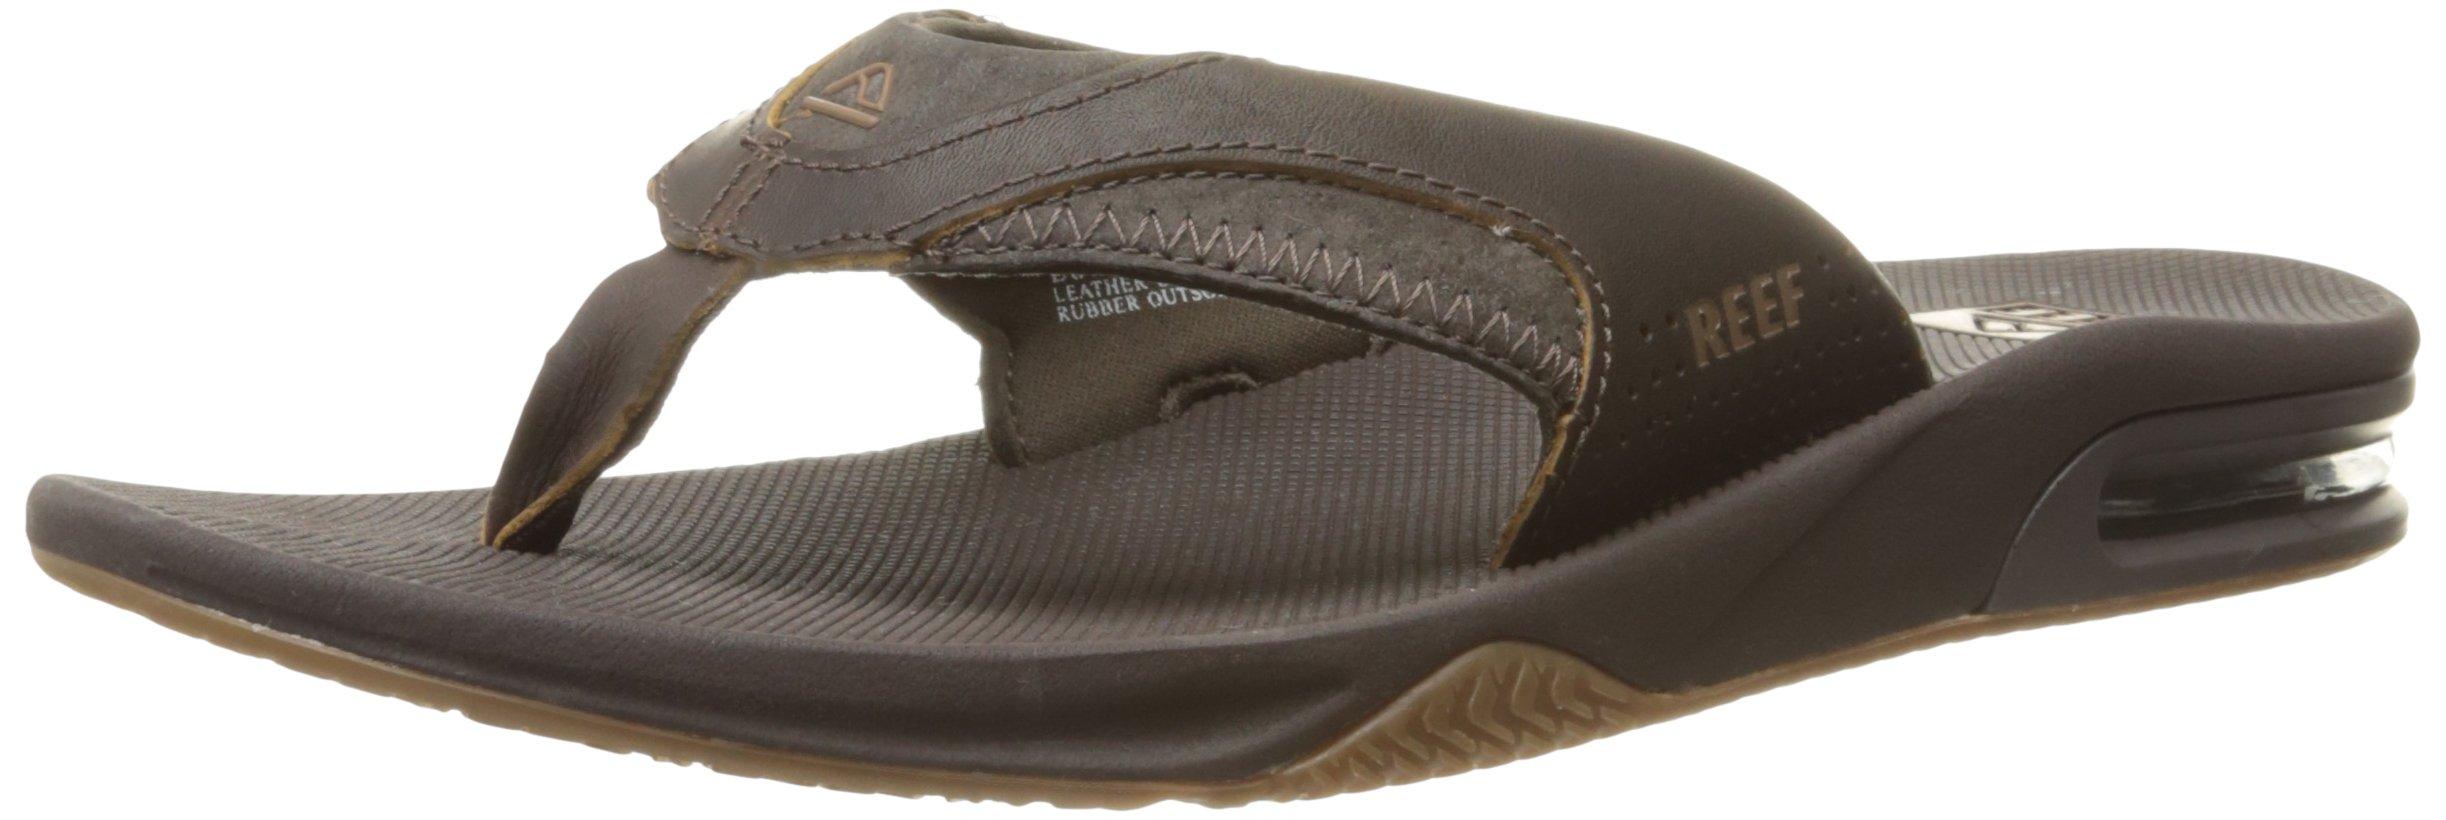 Reef Men's Leather Fanning Sandal, Brown, 9 M US